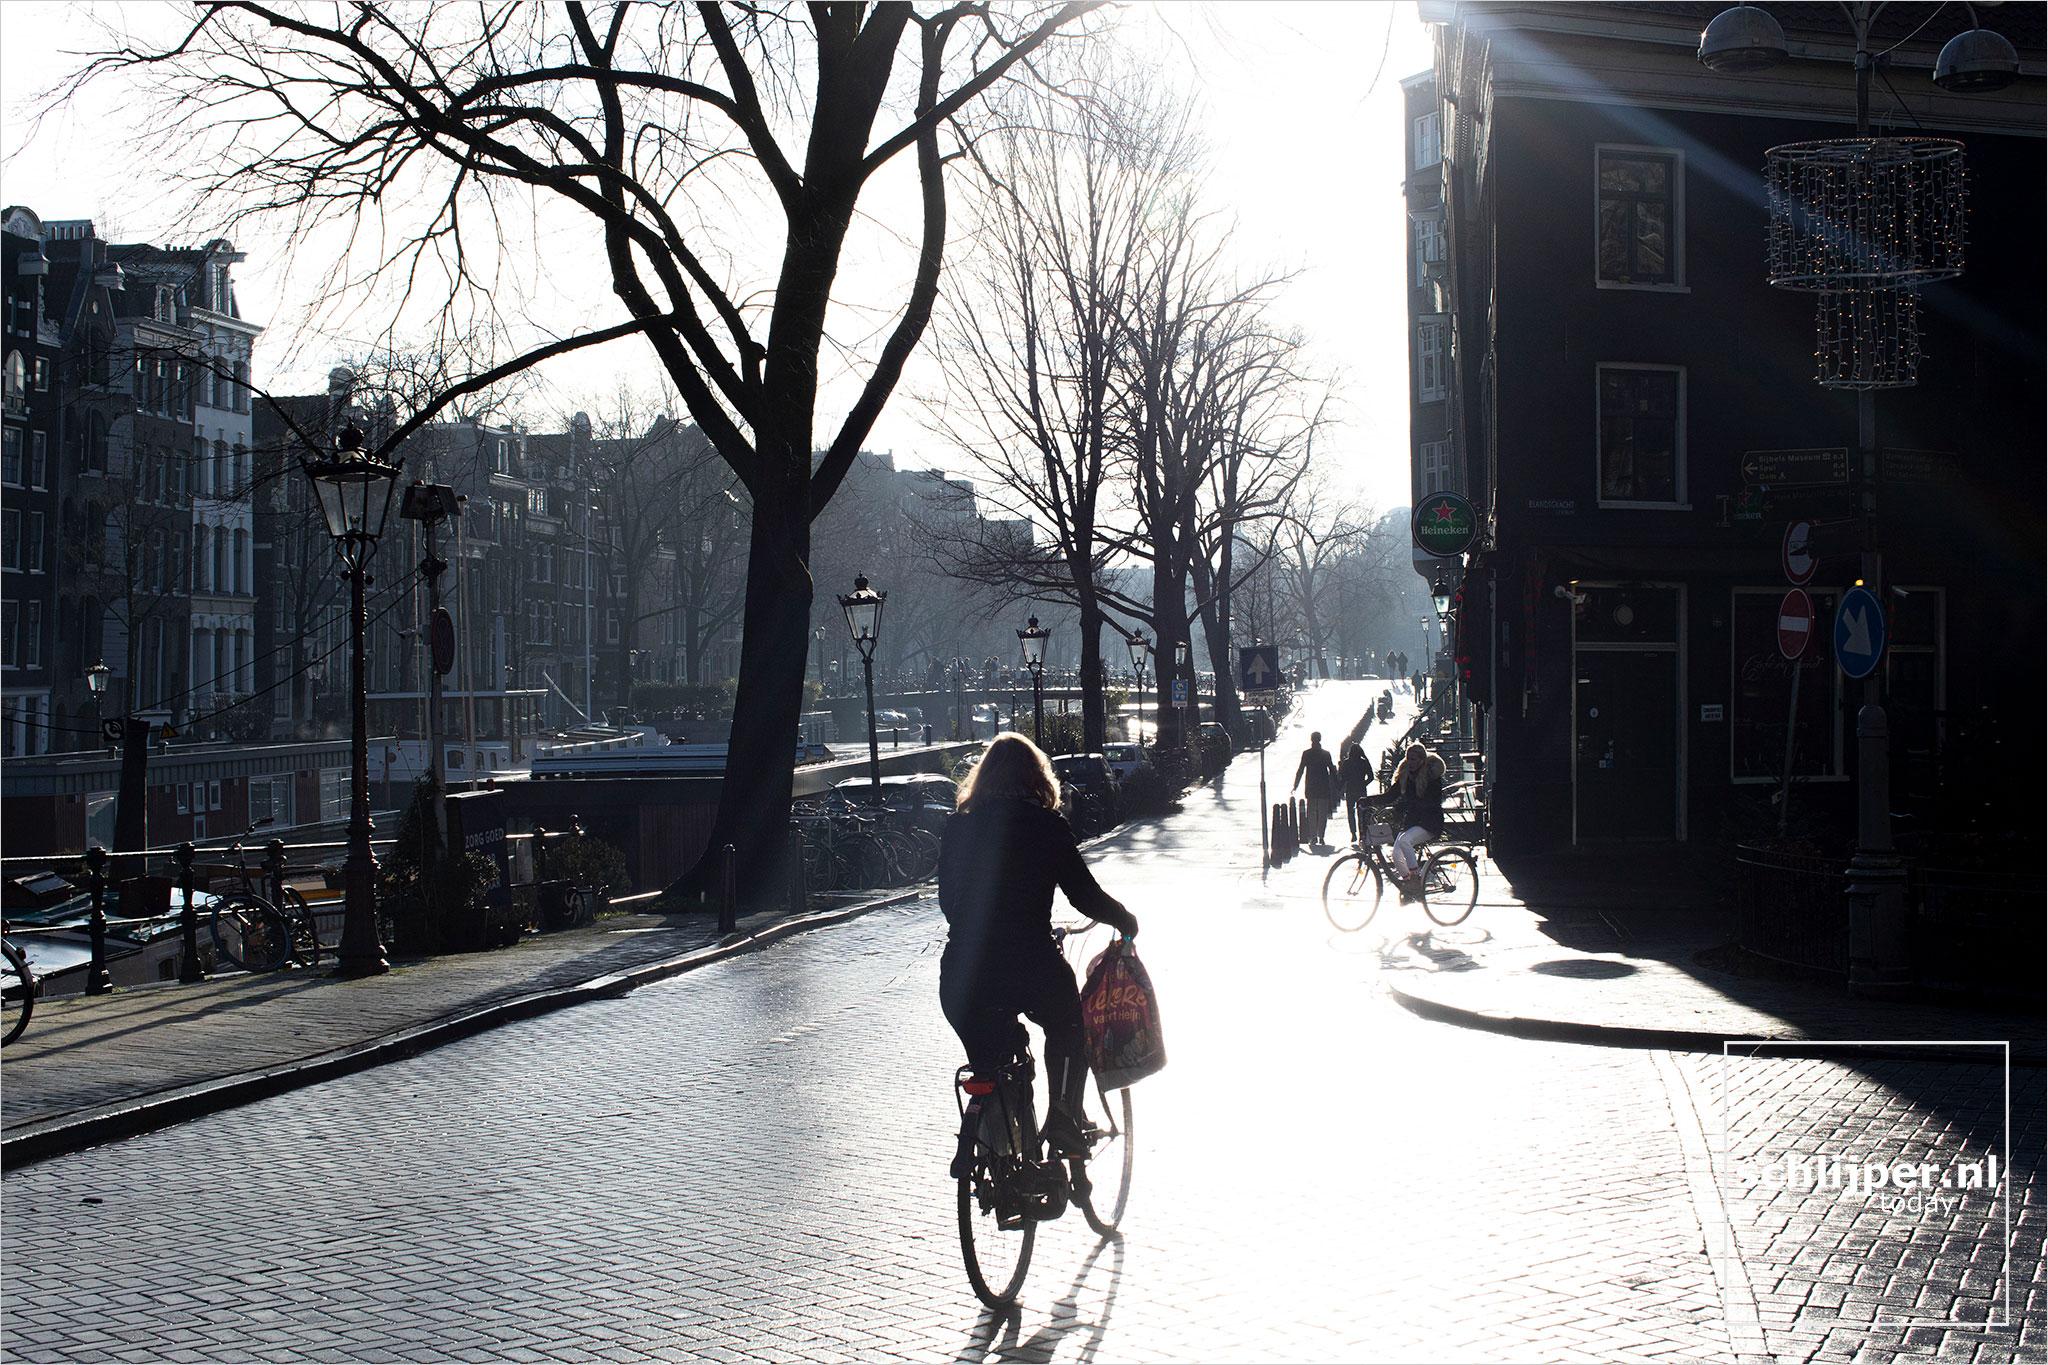 The Netherlands, Amsterdam, 1 januari 2021